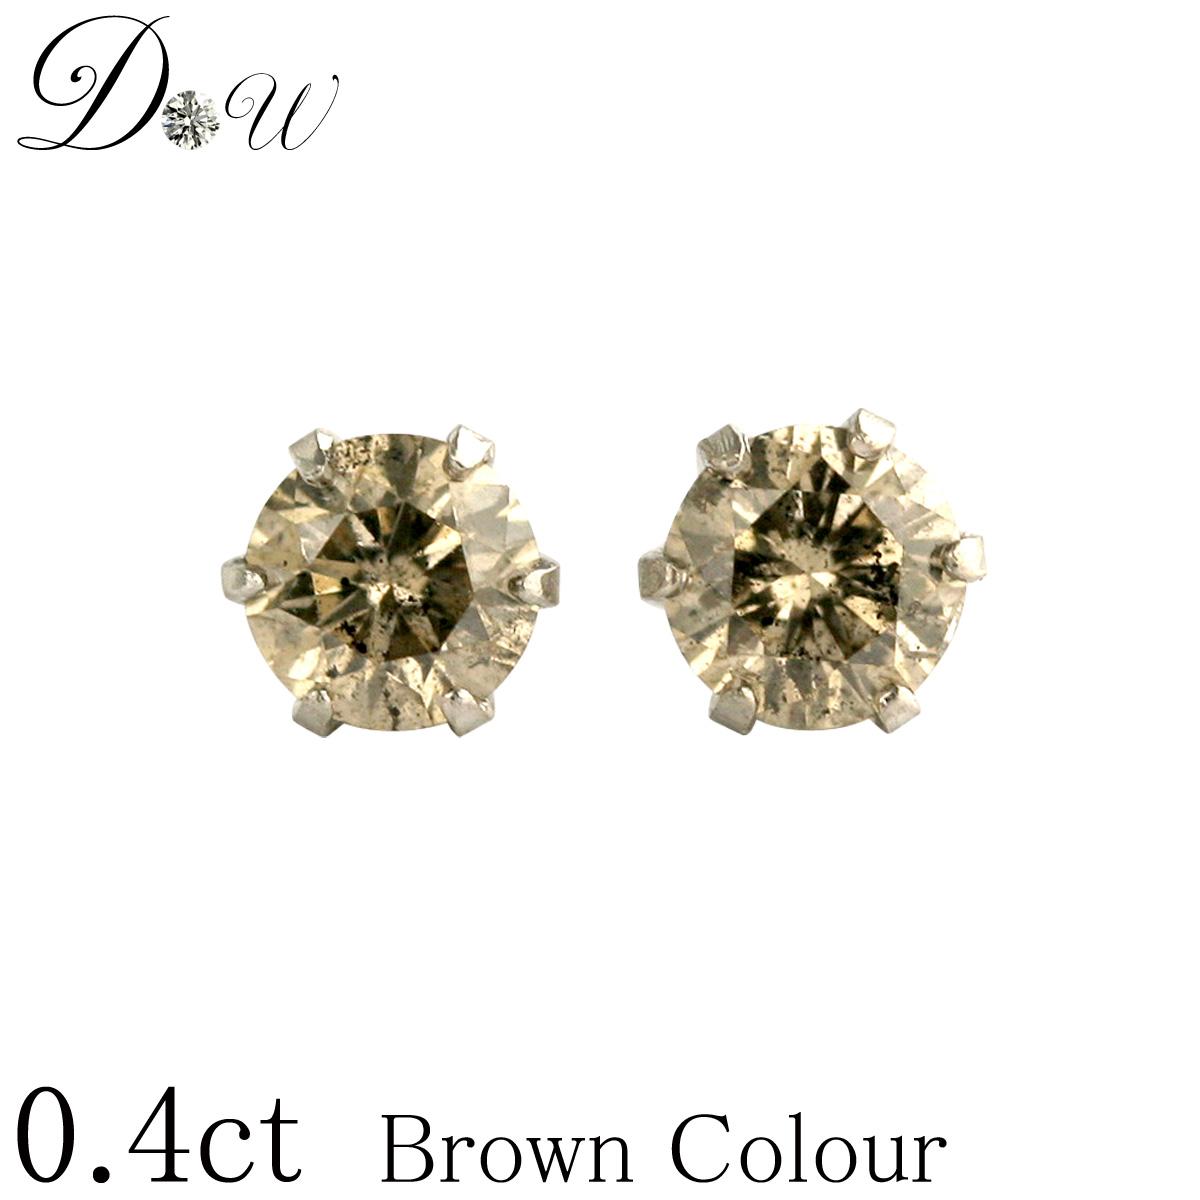 PT900 ダイヤモンド ピアスライトブラウンカラー 0.40ct【6本爪タイプ】【品質保証書付】天然ダイヤモンド【 輝き厳選保証 】【即日発送可】